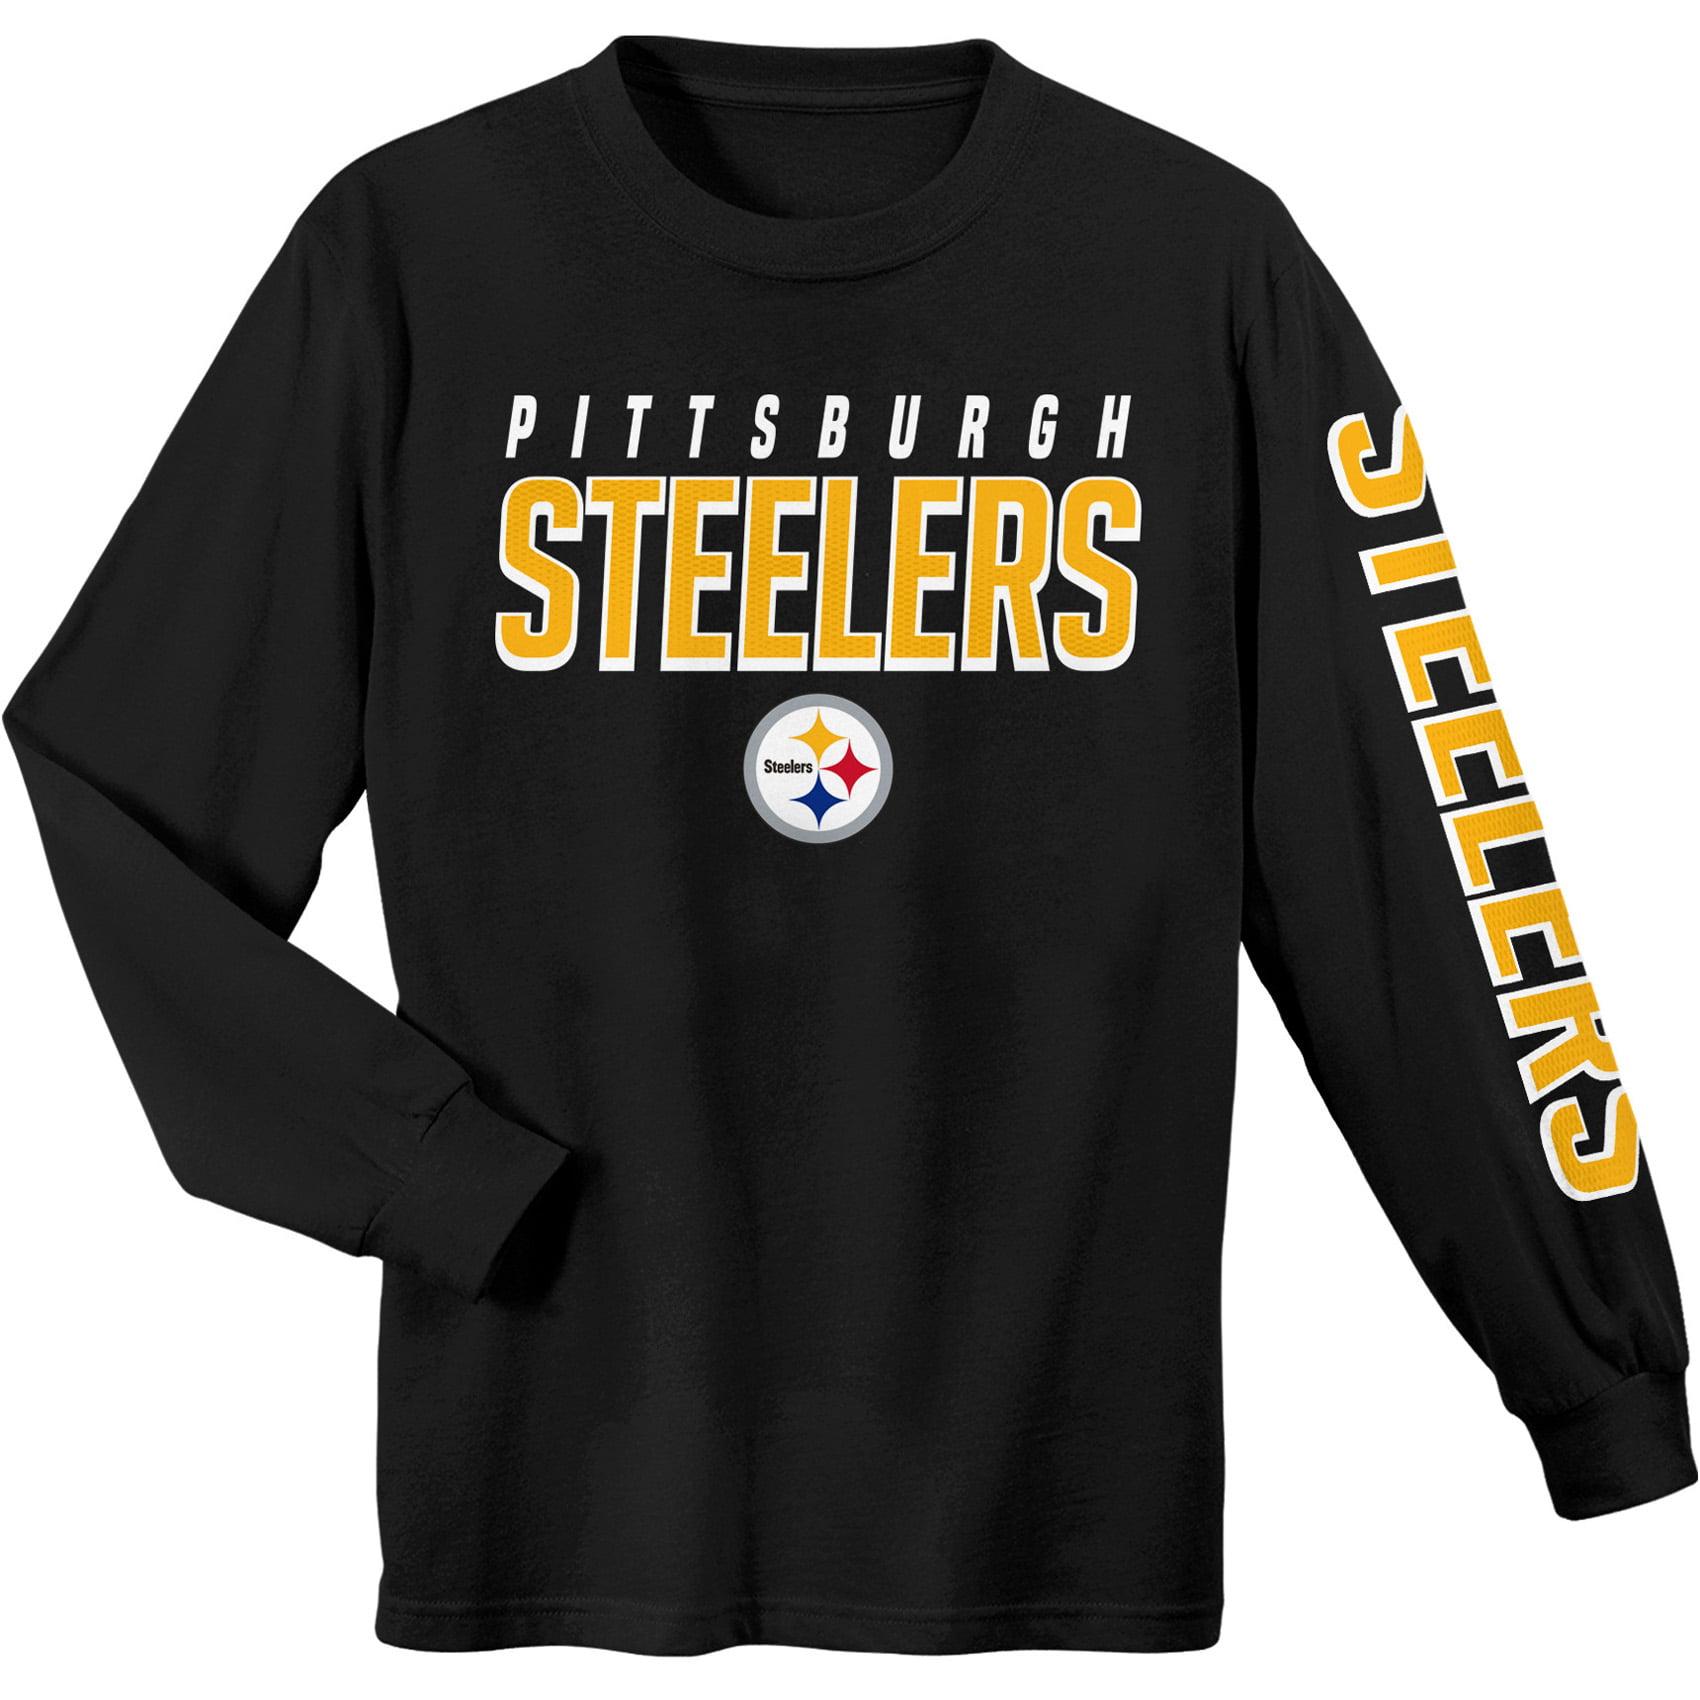 Youth Black Pittsburgh Steelers Sleeve Hit Long Sleeve T-Shirt